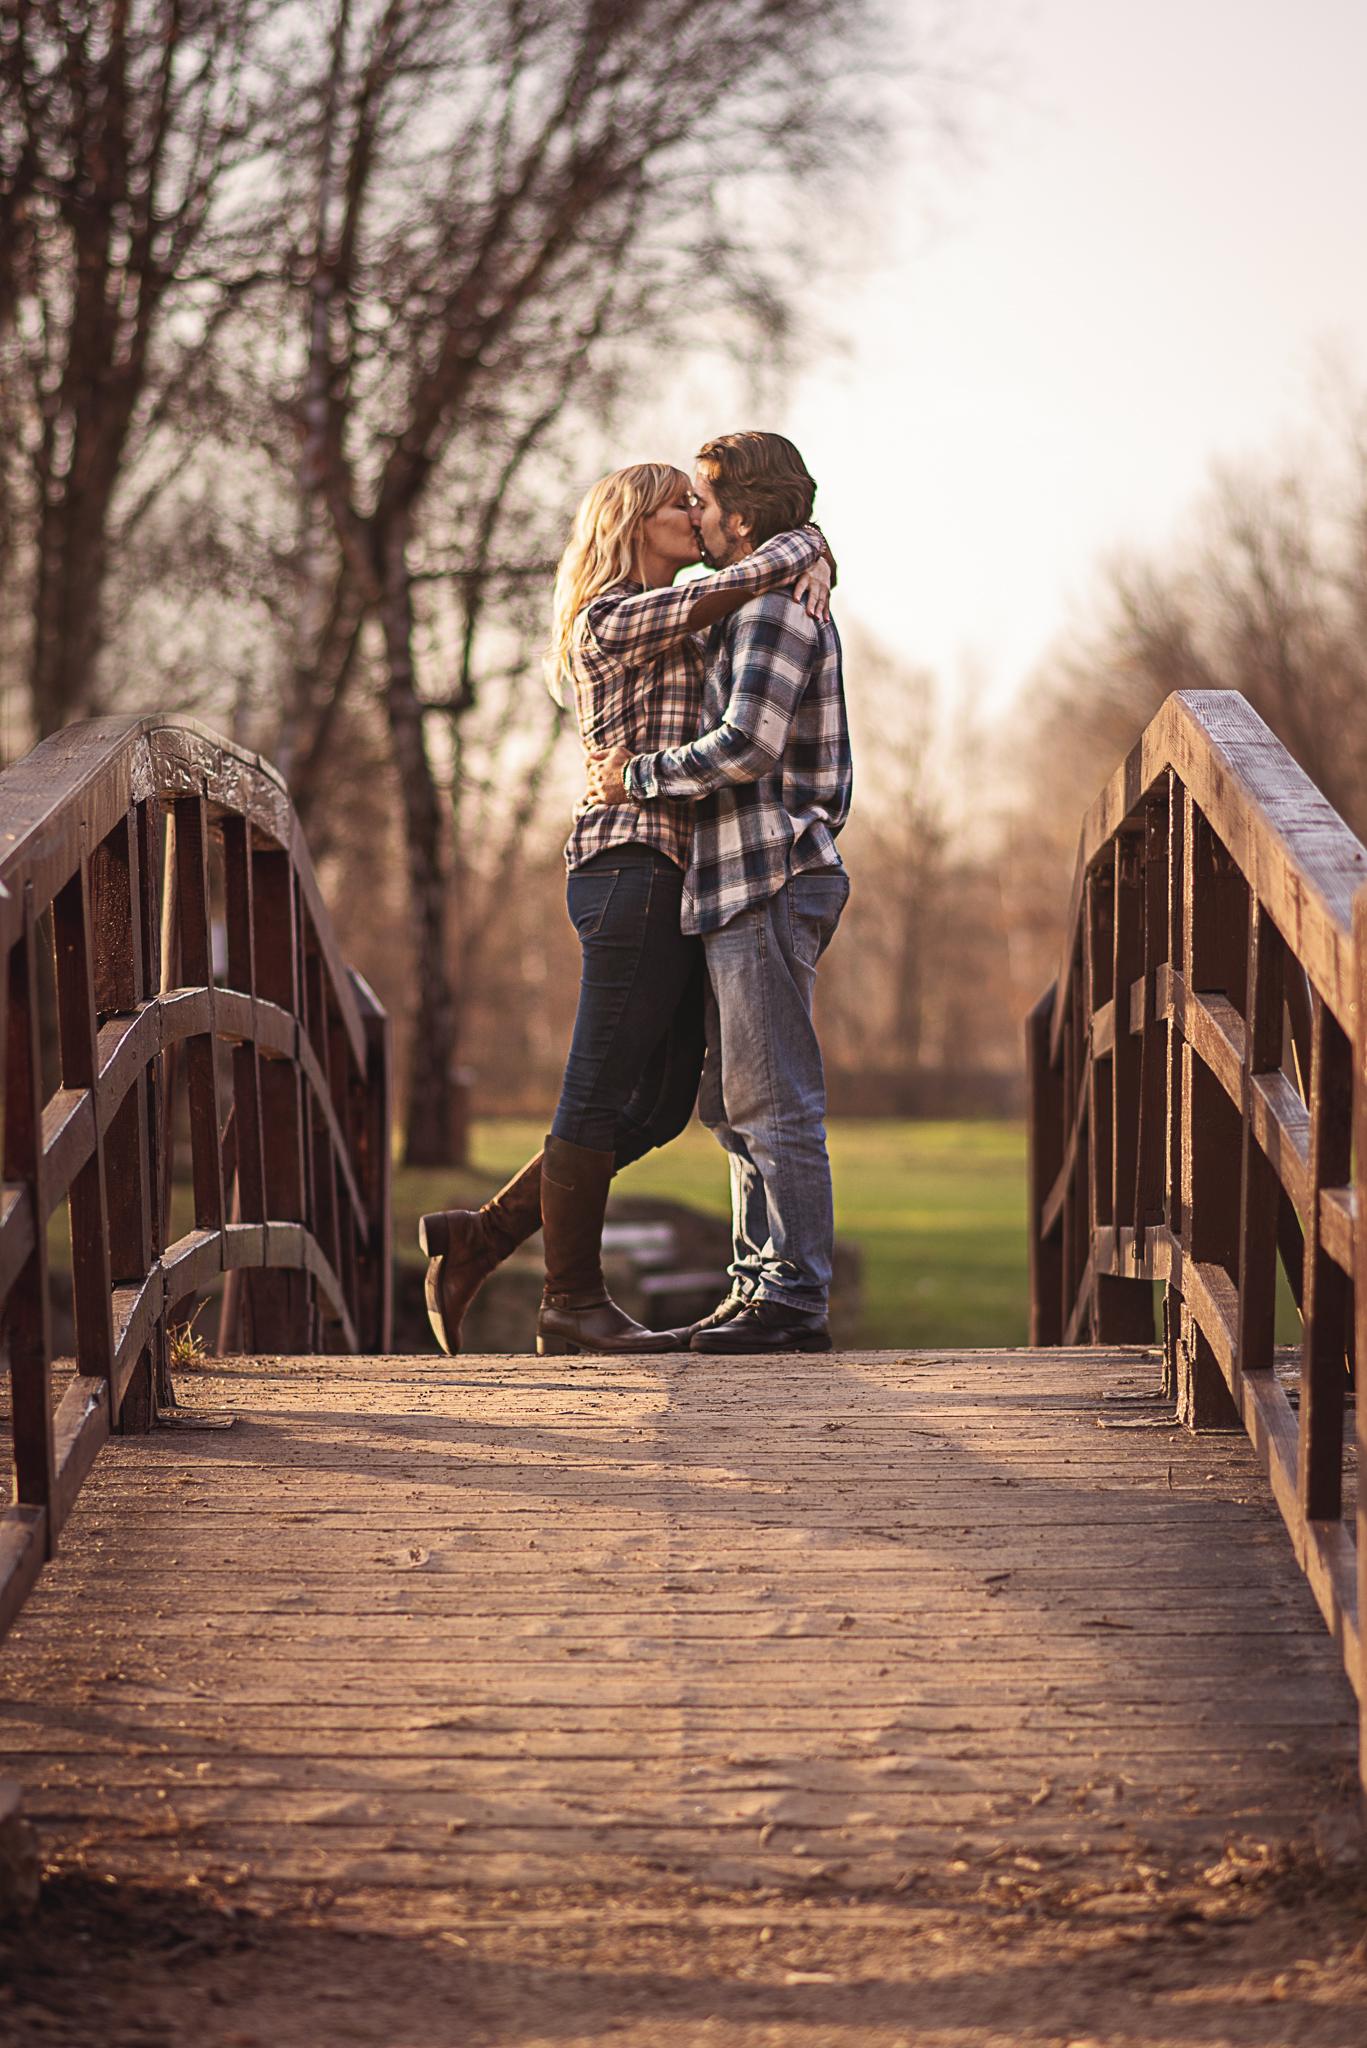 całująca się para na moście